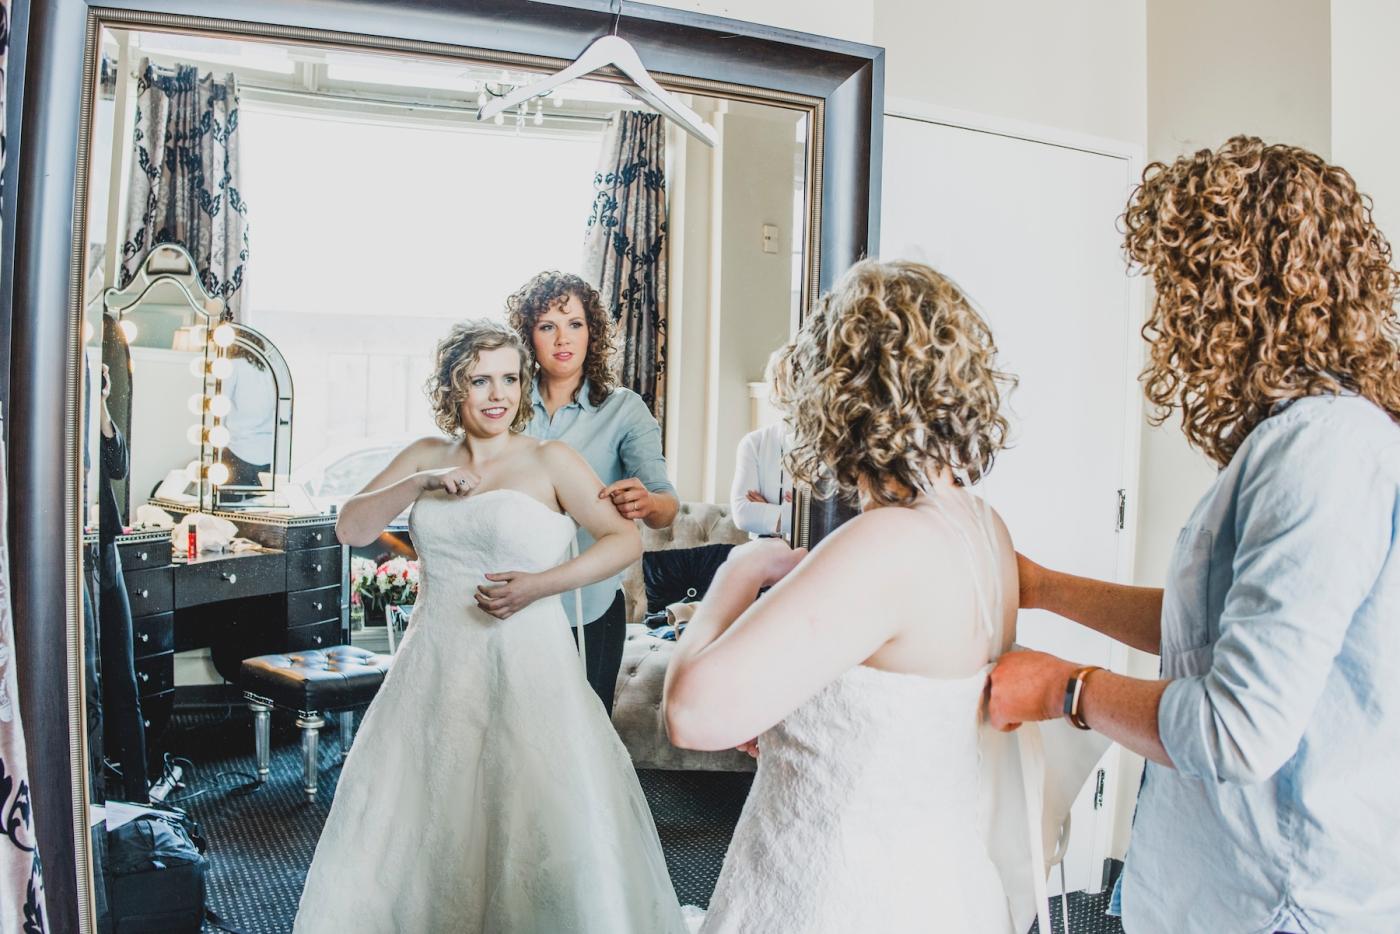 DSC_1854Everett_Wedding_Ballroom_Jane_Speleers_photography_Rachel_and_Edmund_Getting_ready_2017